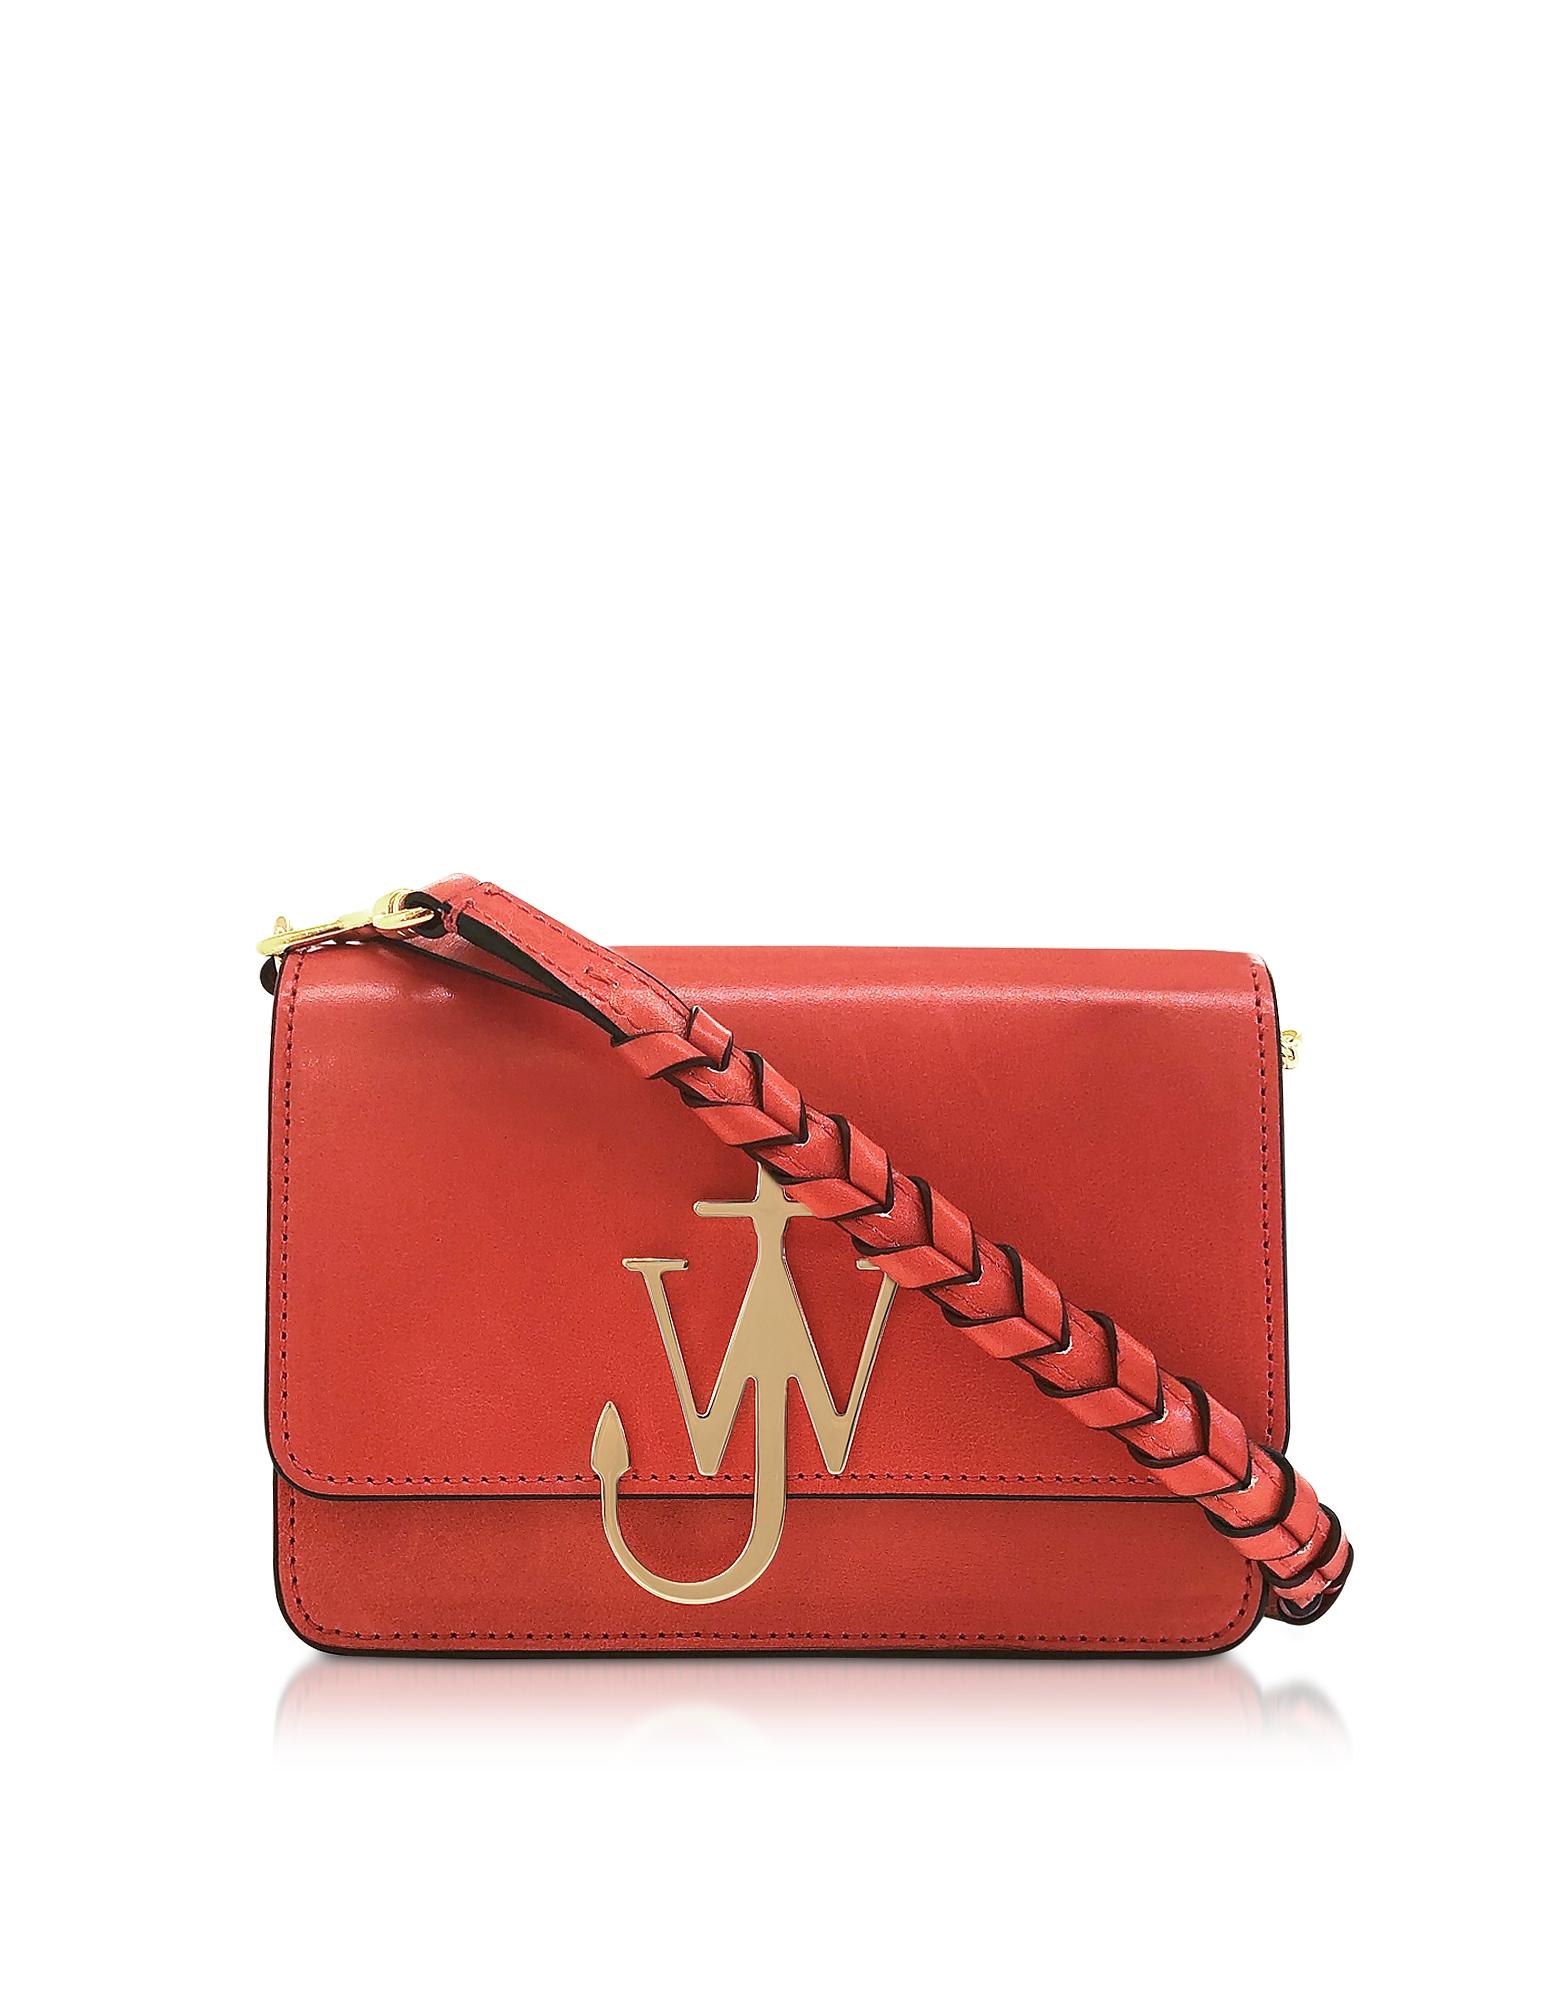 Anchor Logo Bag w/Braided Strap, Candy pink